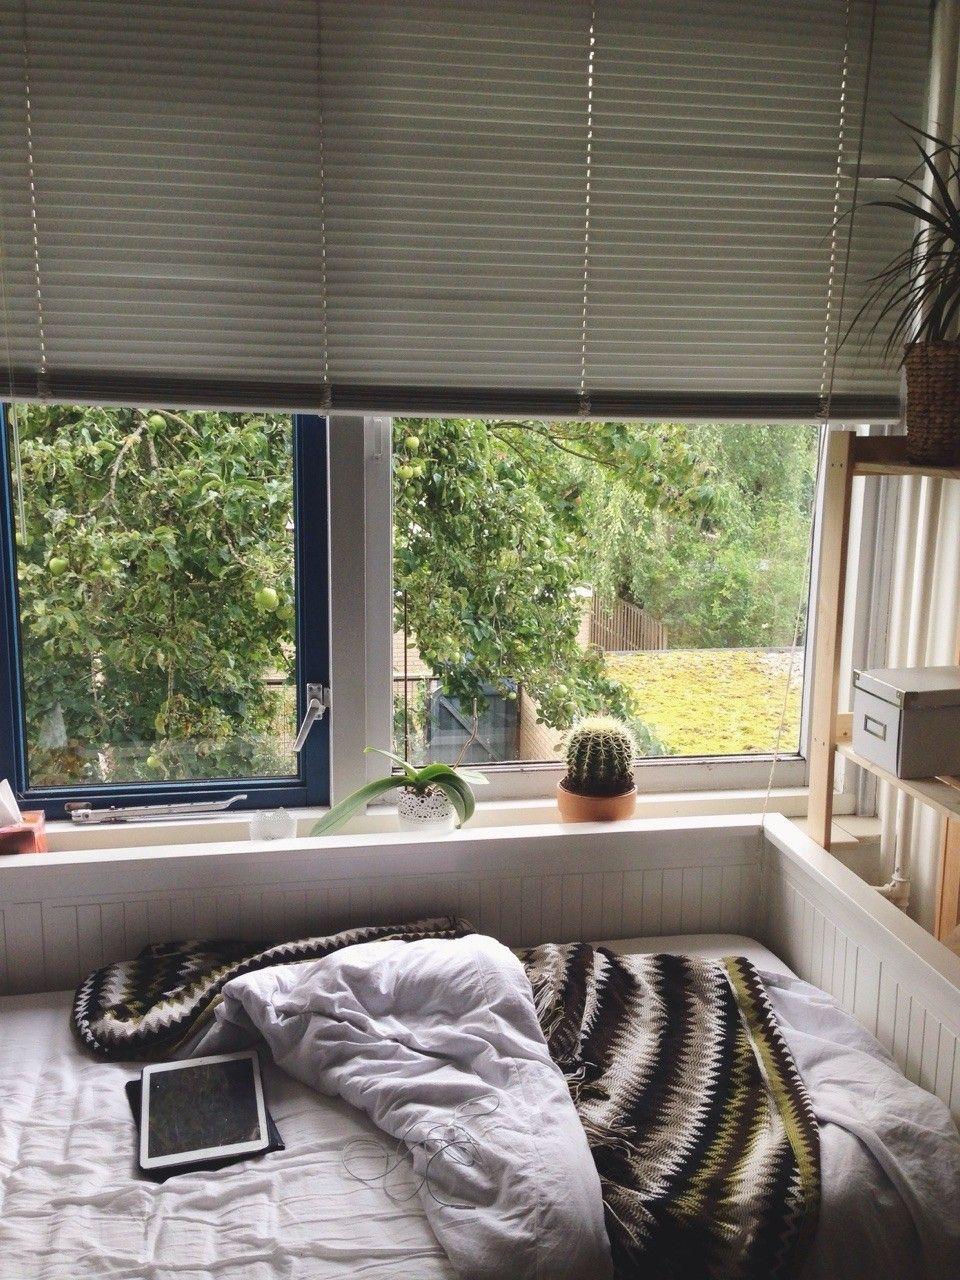 joyenny bedroom inspo pinterest bedrooms room and